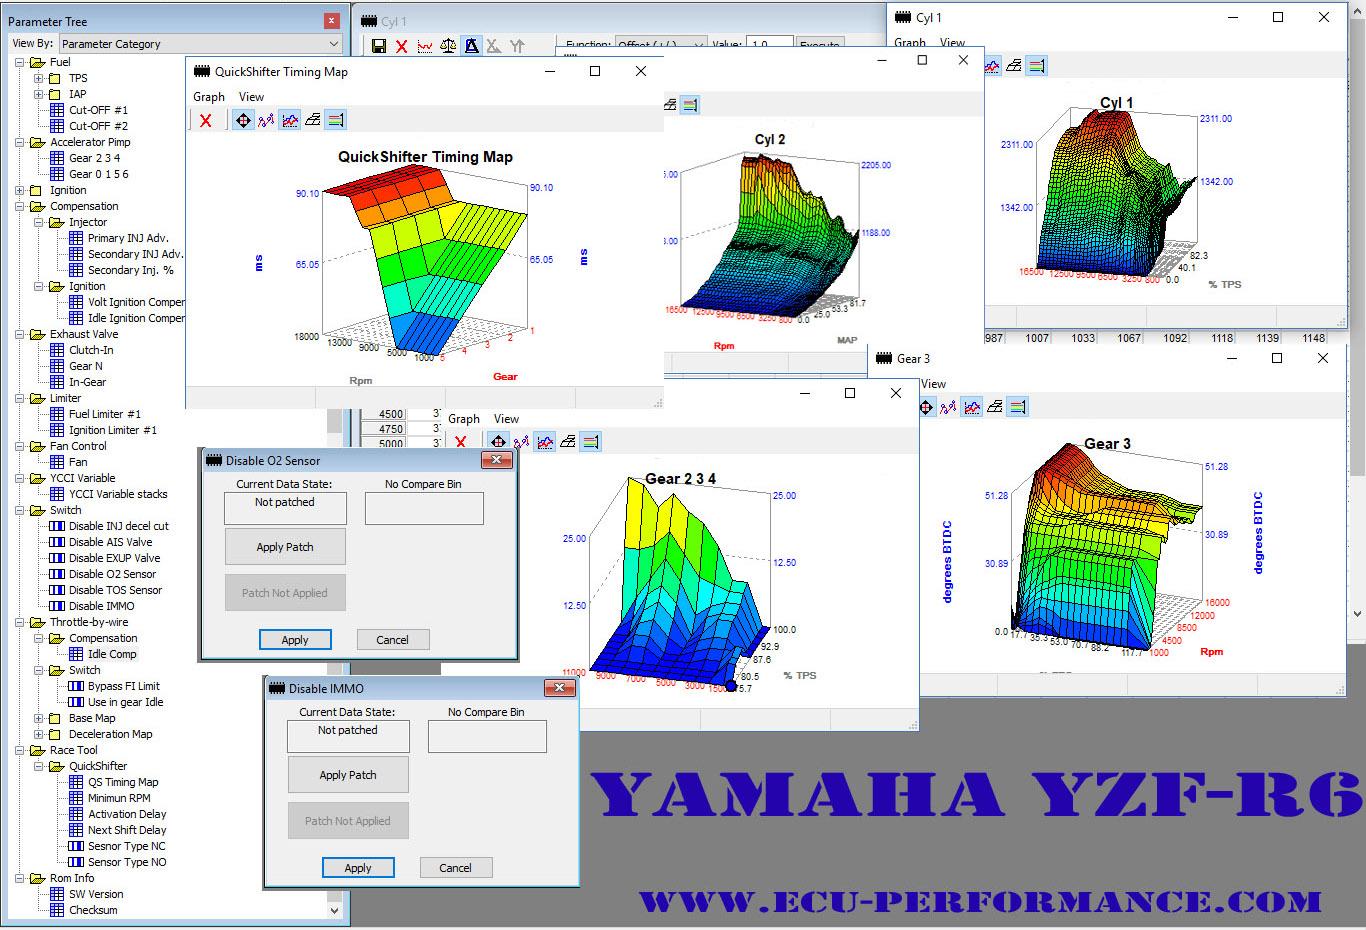 Yamaha – Ecu-performance